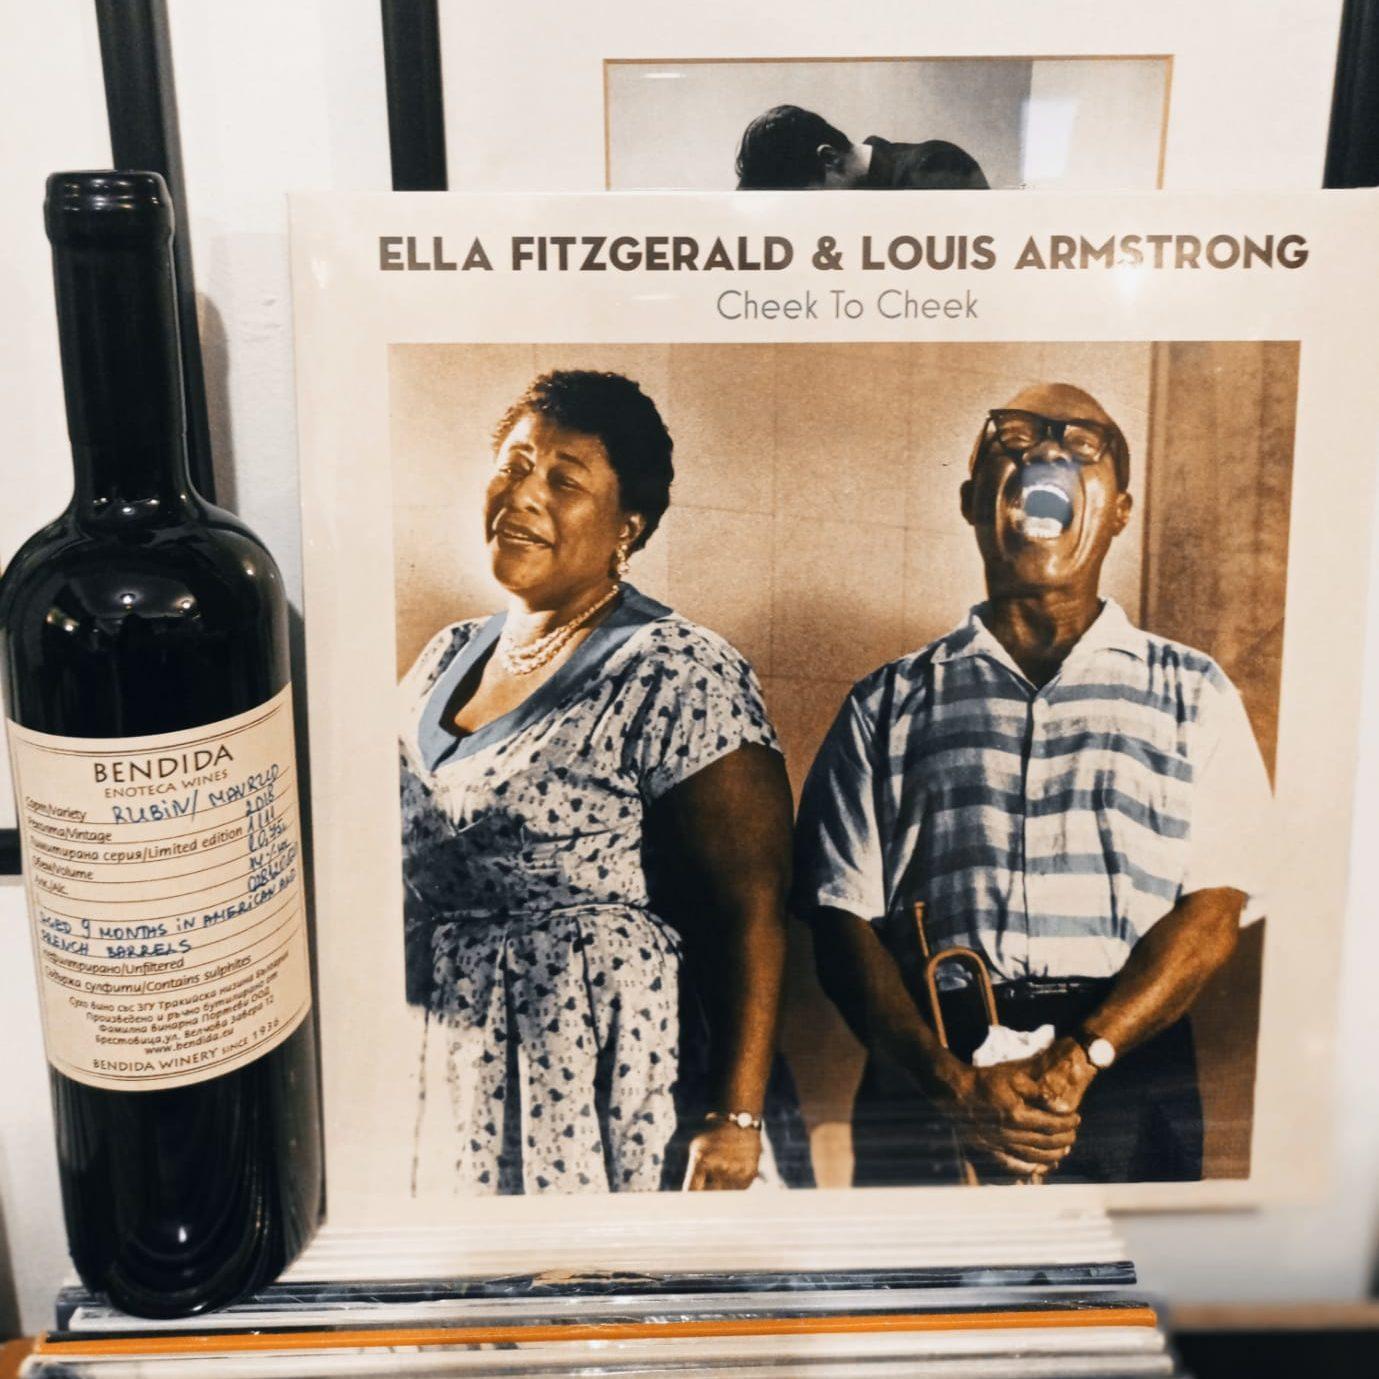 "Ella Fitzgerald & Louis Armstrong ""Cheek to Cheek"" + Рубин и Мавруд, 2018, изба BENDIDA"